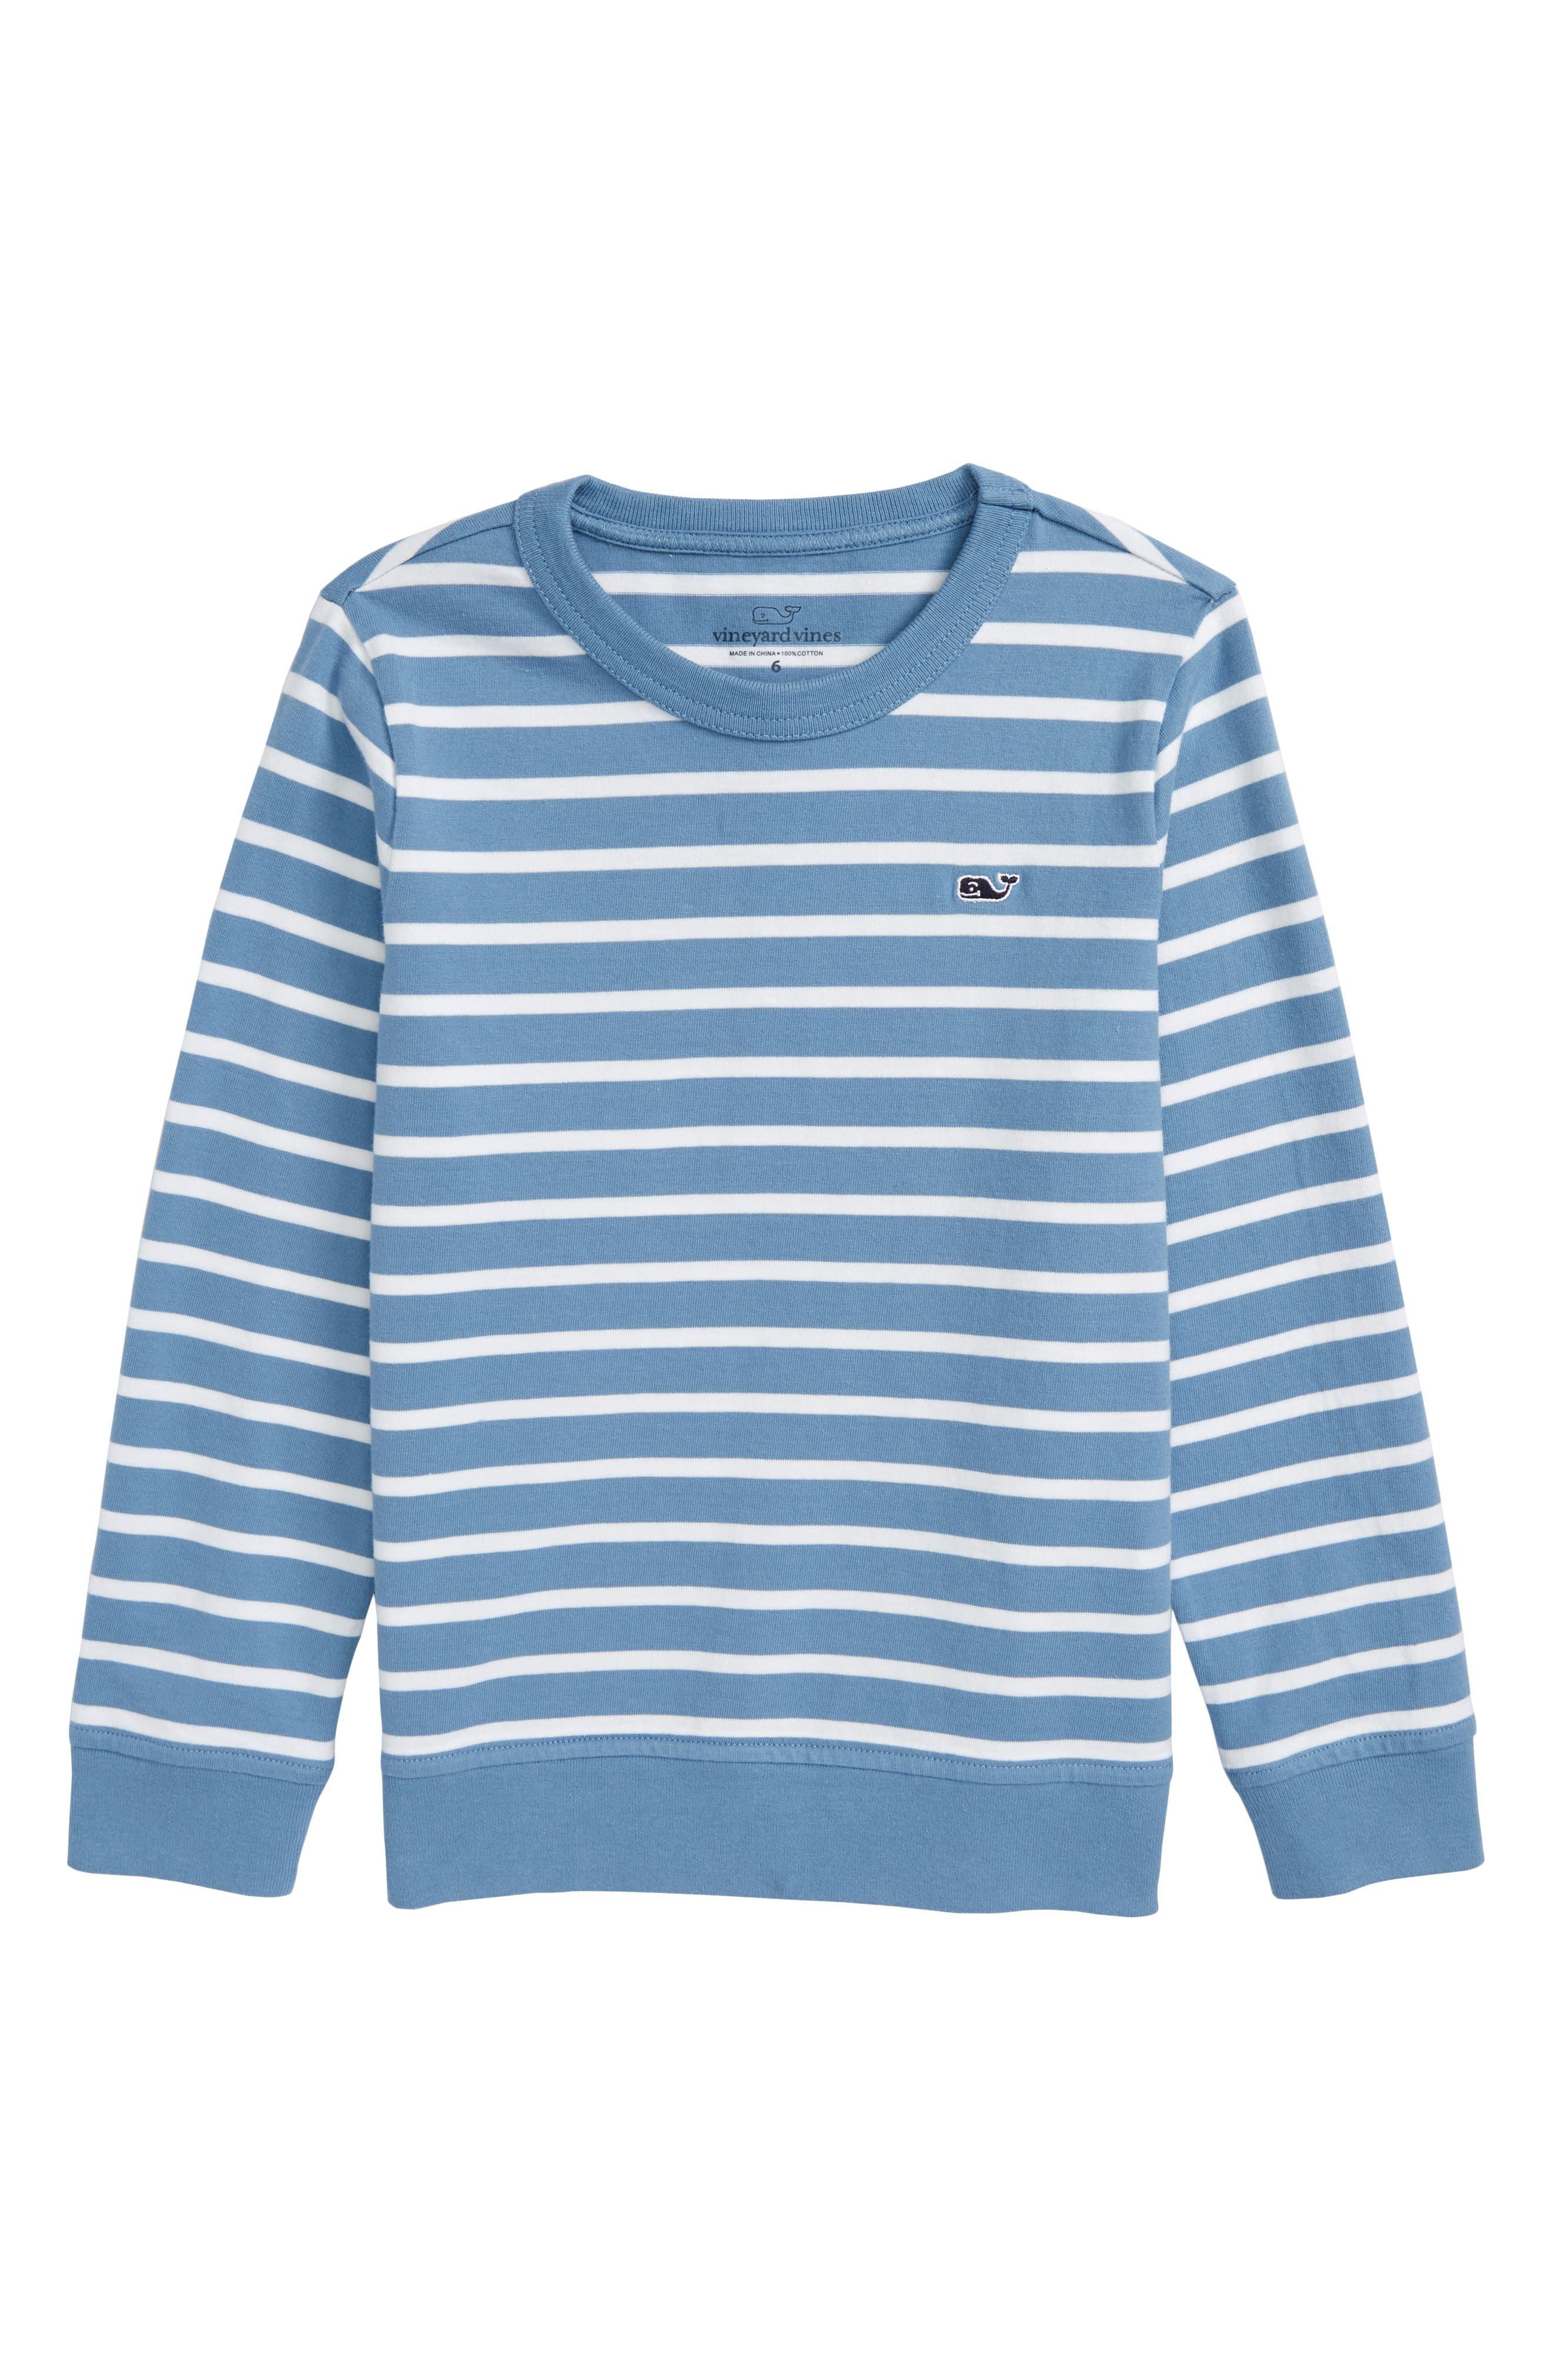 Stripe Crewneck Sweater,                             Main thumbnail 1, color,                             Dockside Blue